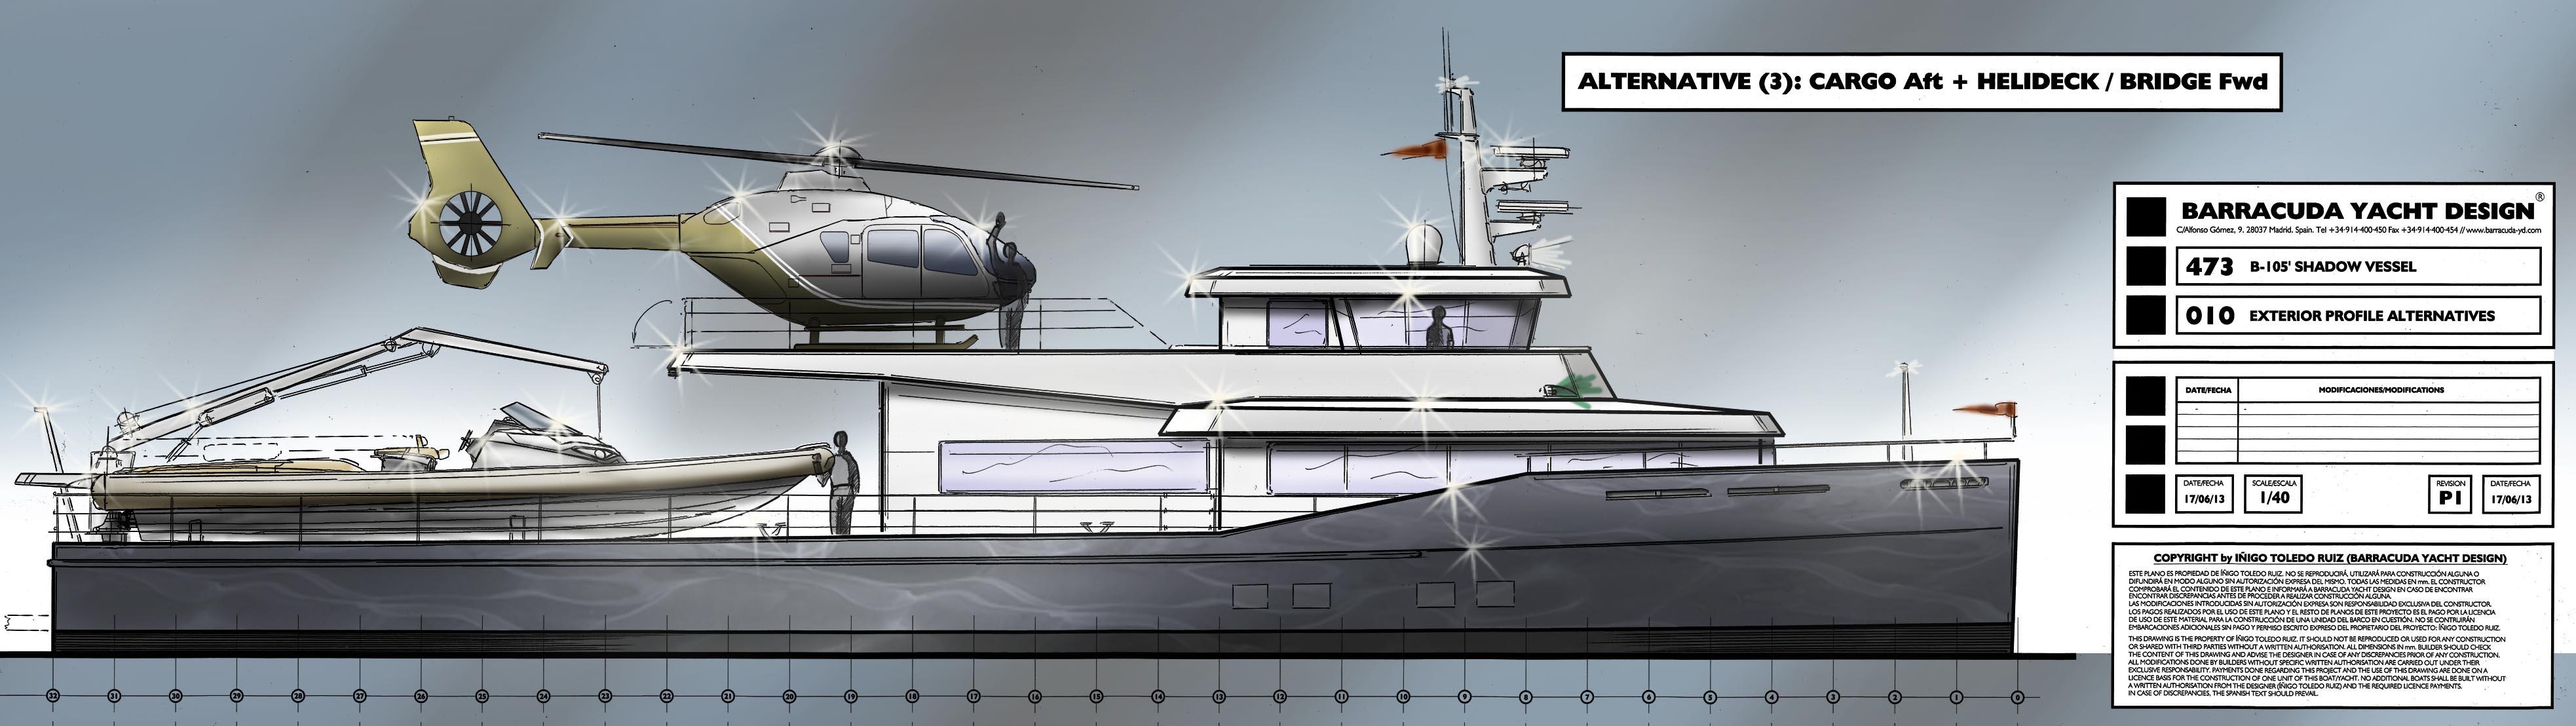 Inigo Toledo - Top Yacht Design